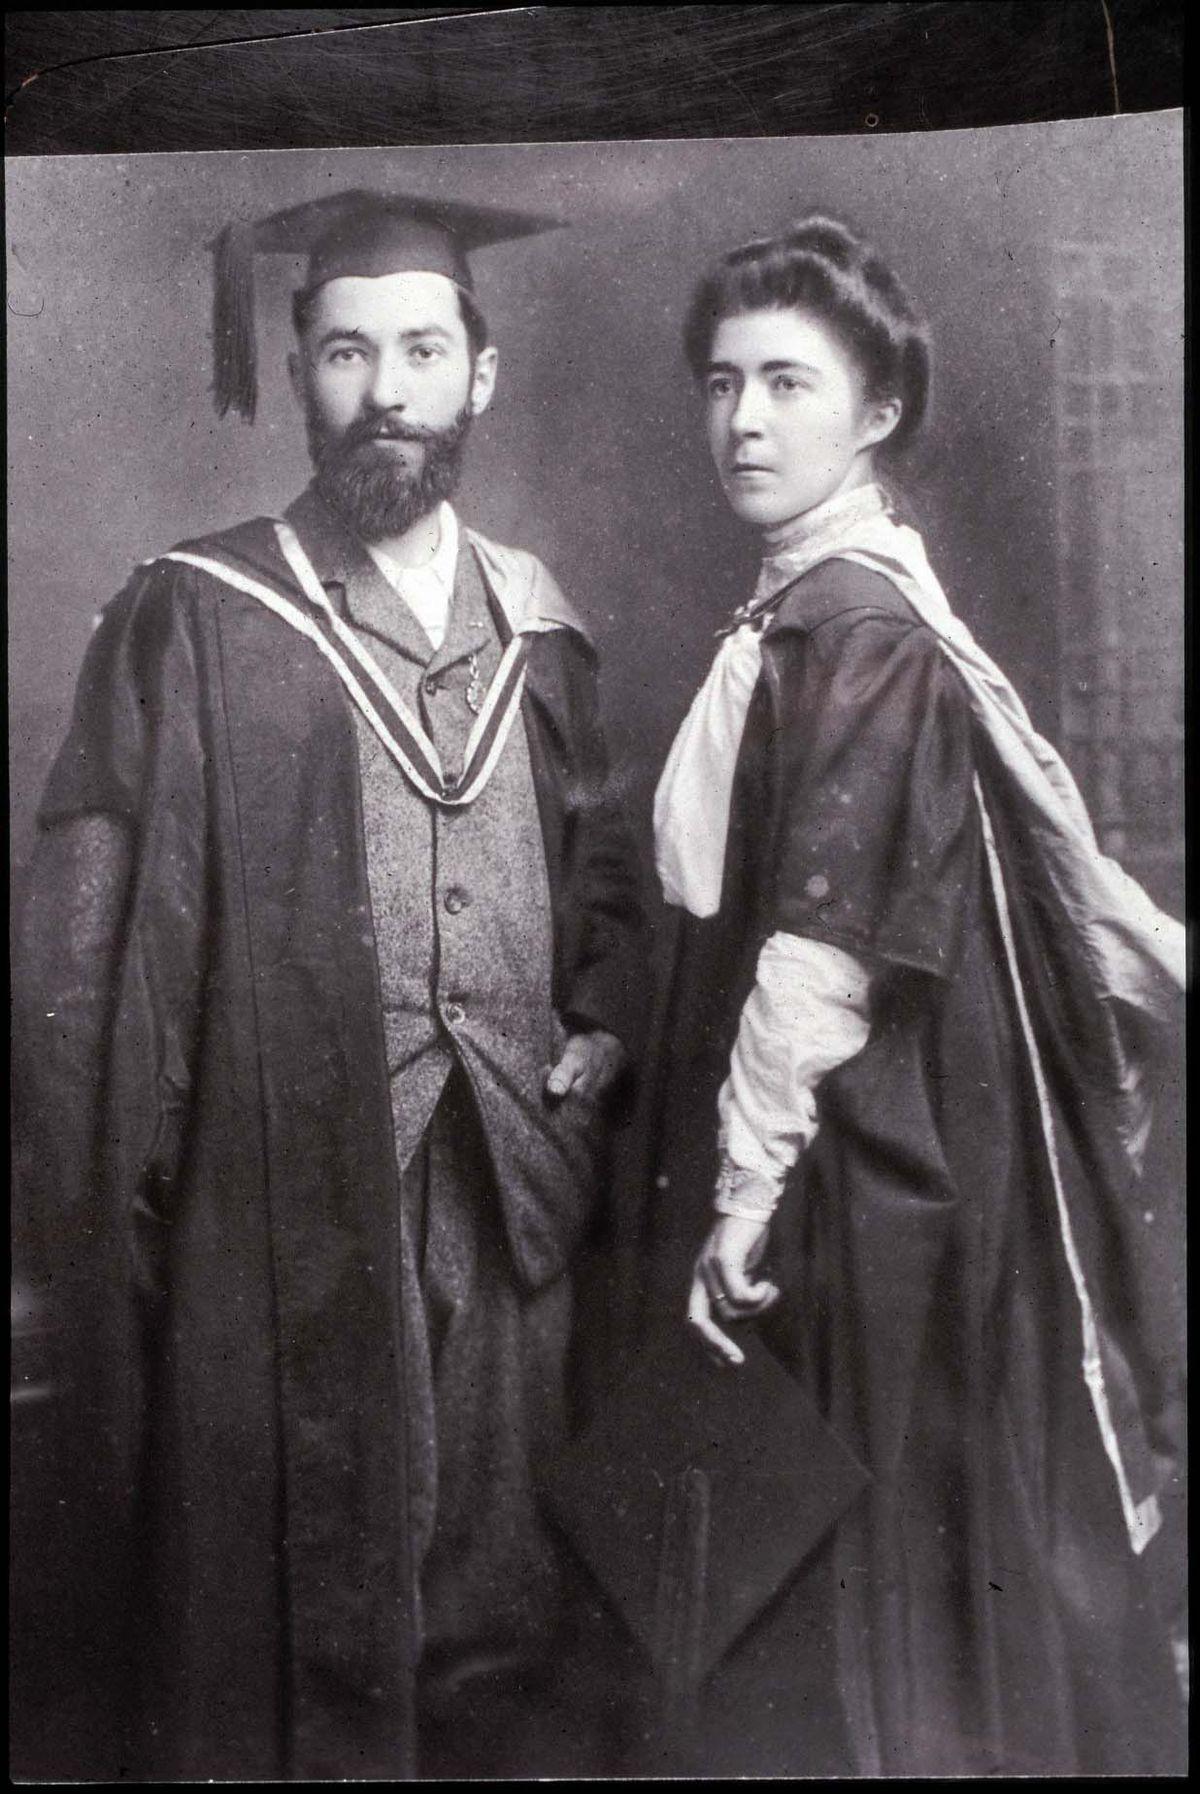 Francis and Hanna Sheehy Skeffington on their wedding day. | Micheline Sheehy Skeffington